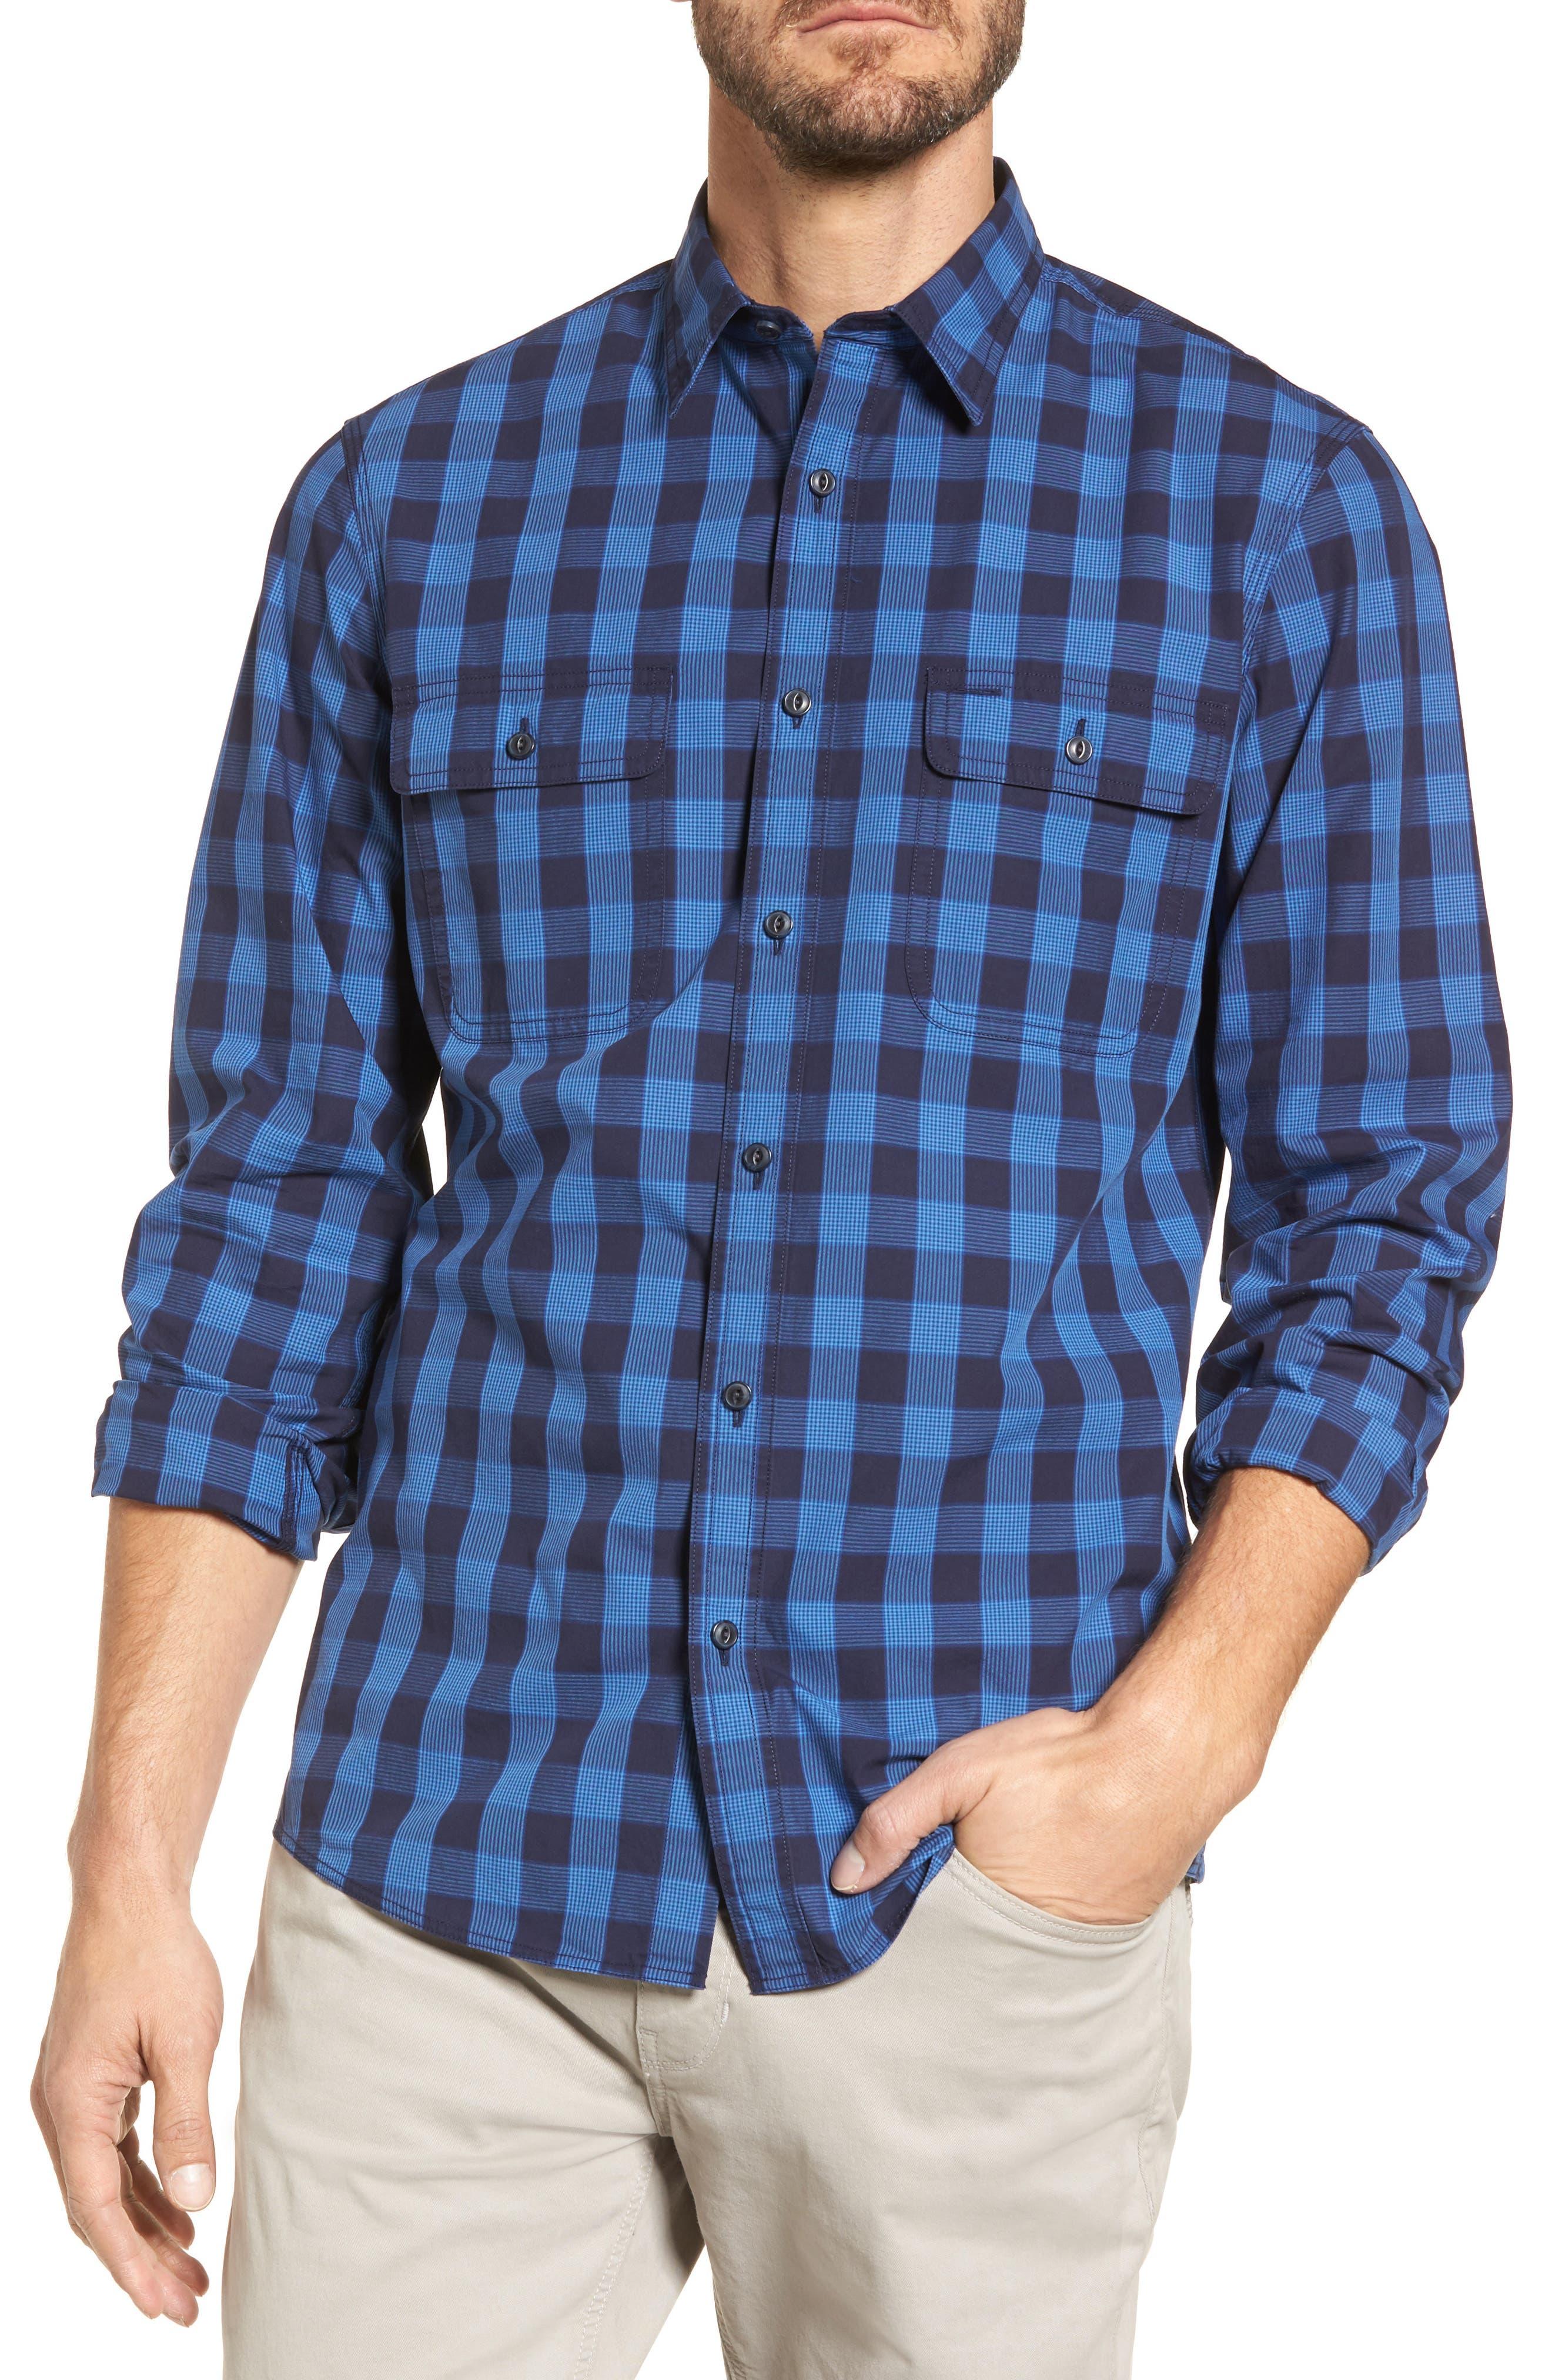 Trim Fit Plaid Trucker Sport Shirt,                             Main thumbnail 1, color,                             Navy Iris Blue Check